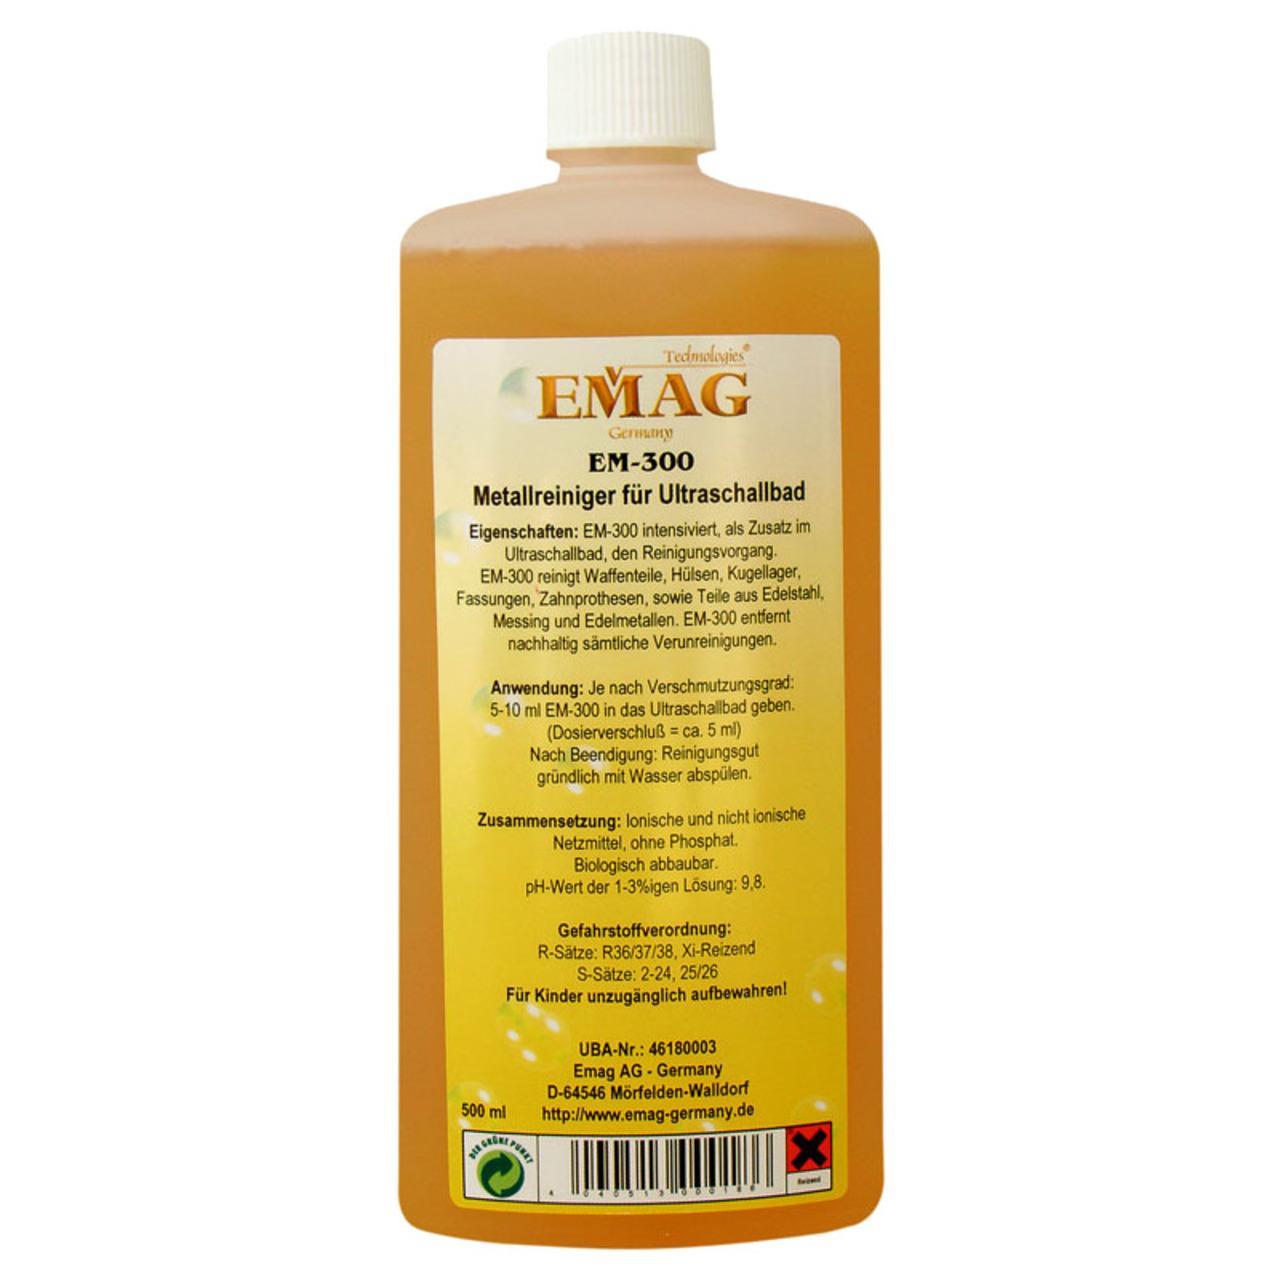 EMAG Metallreiniger EM-300, 500 ml